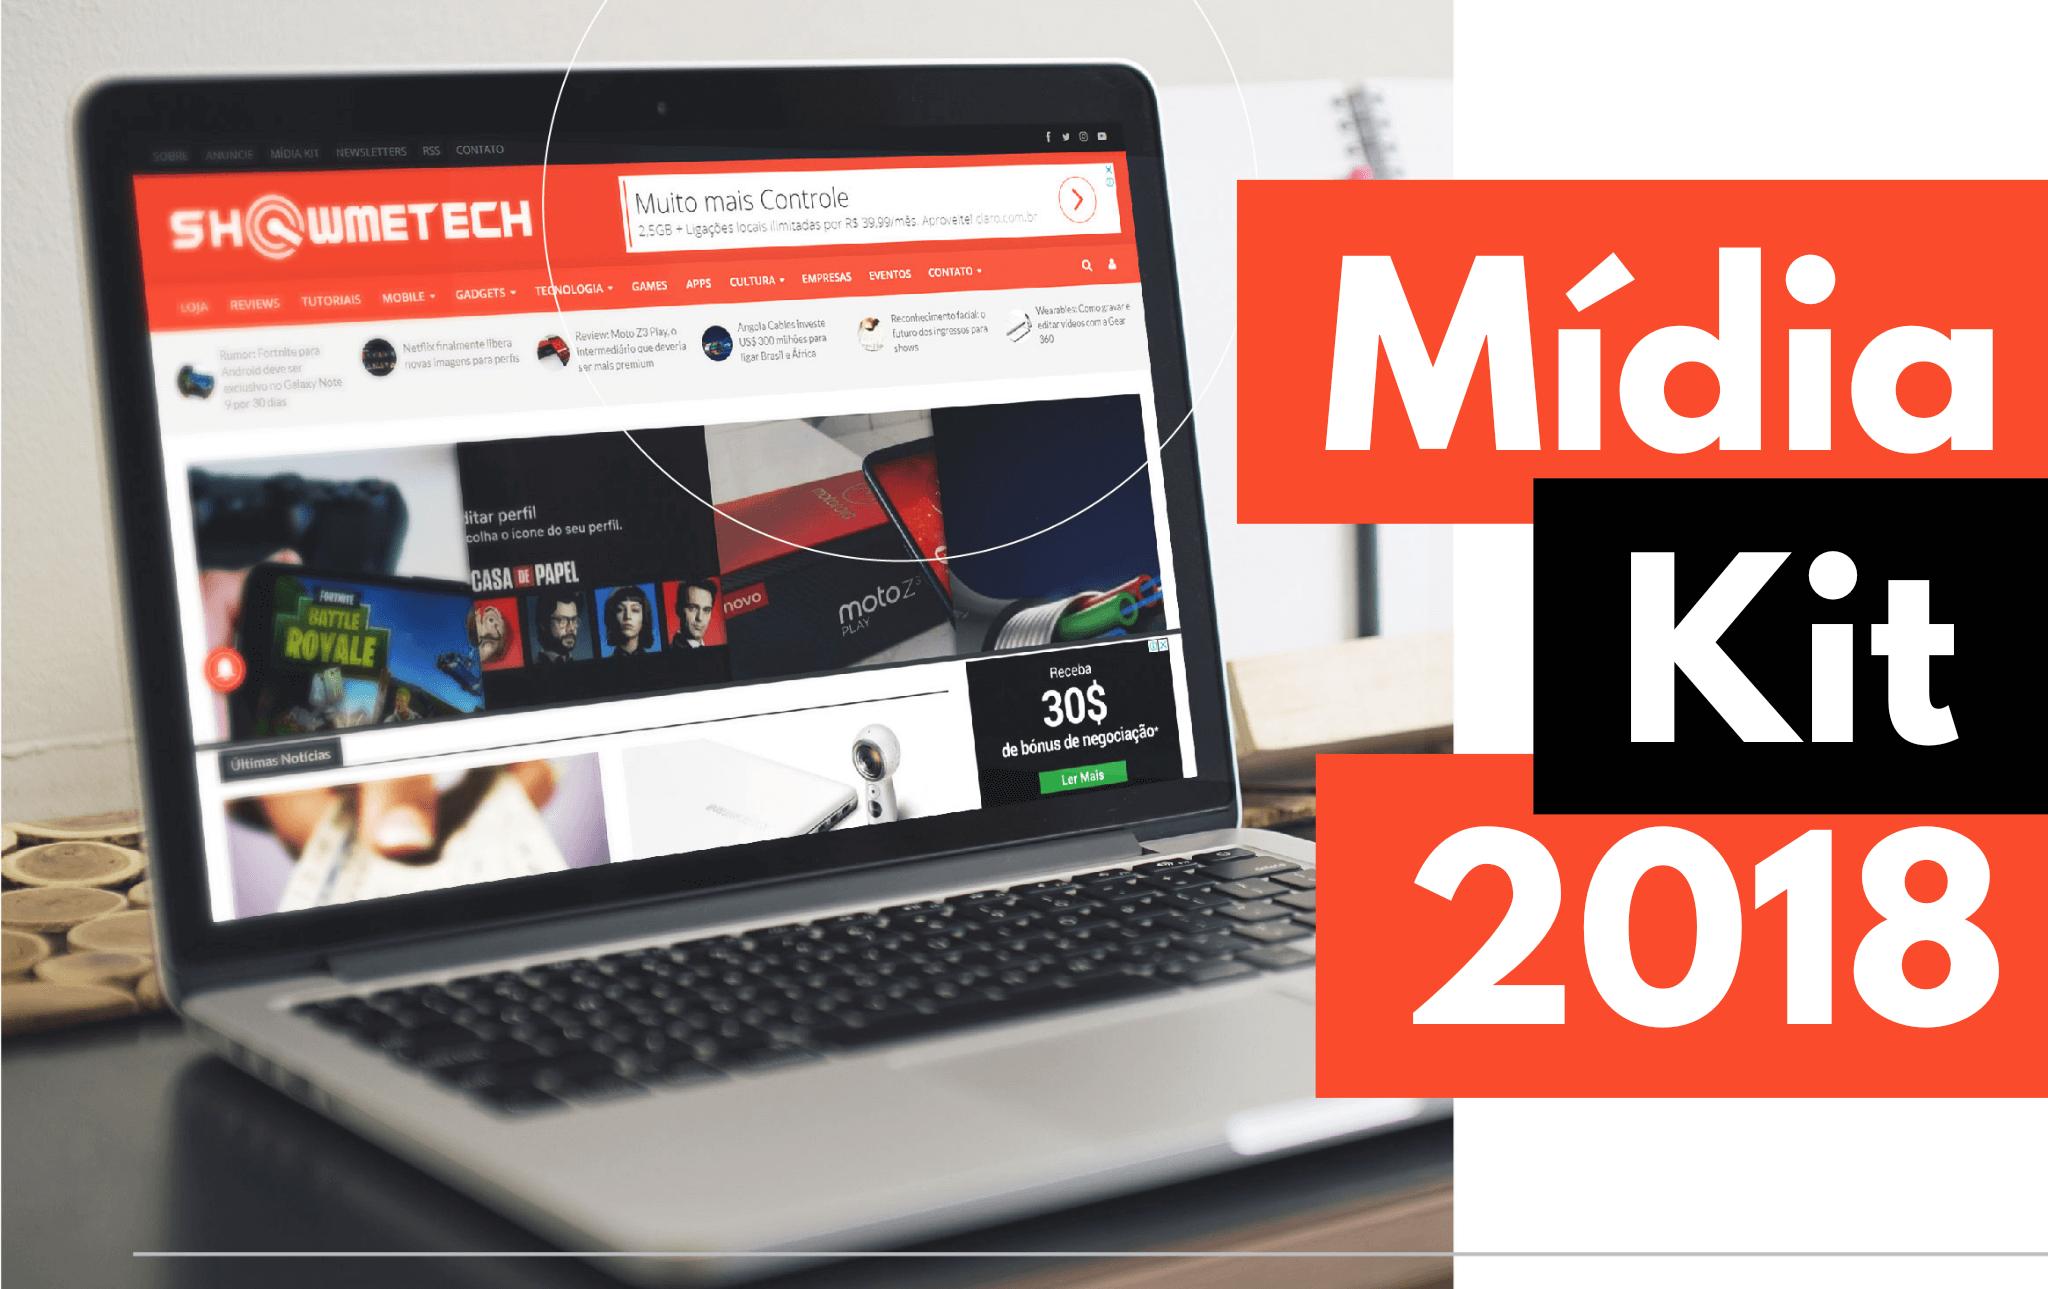 Showmetech mídia kit 2018